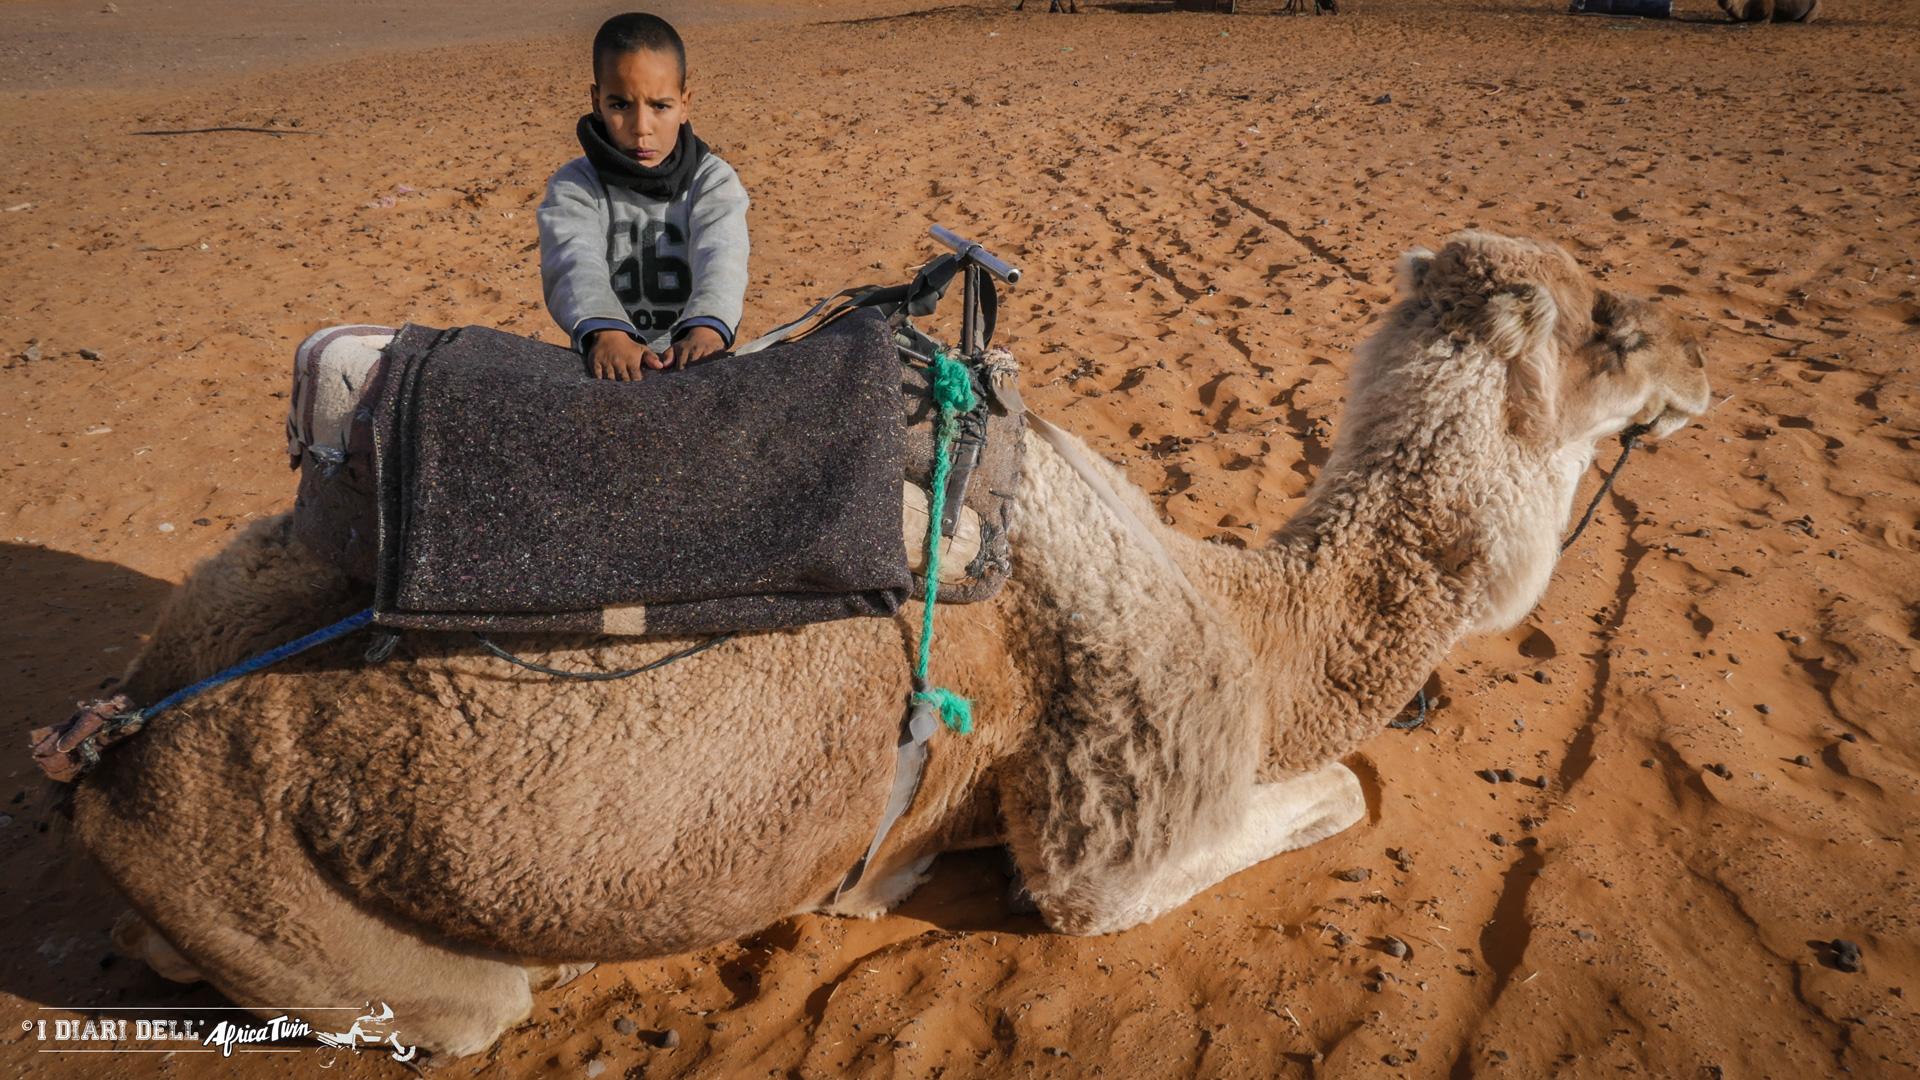 marocco in solitaria tour cammello merzouga